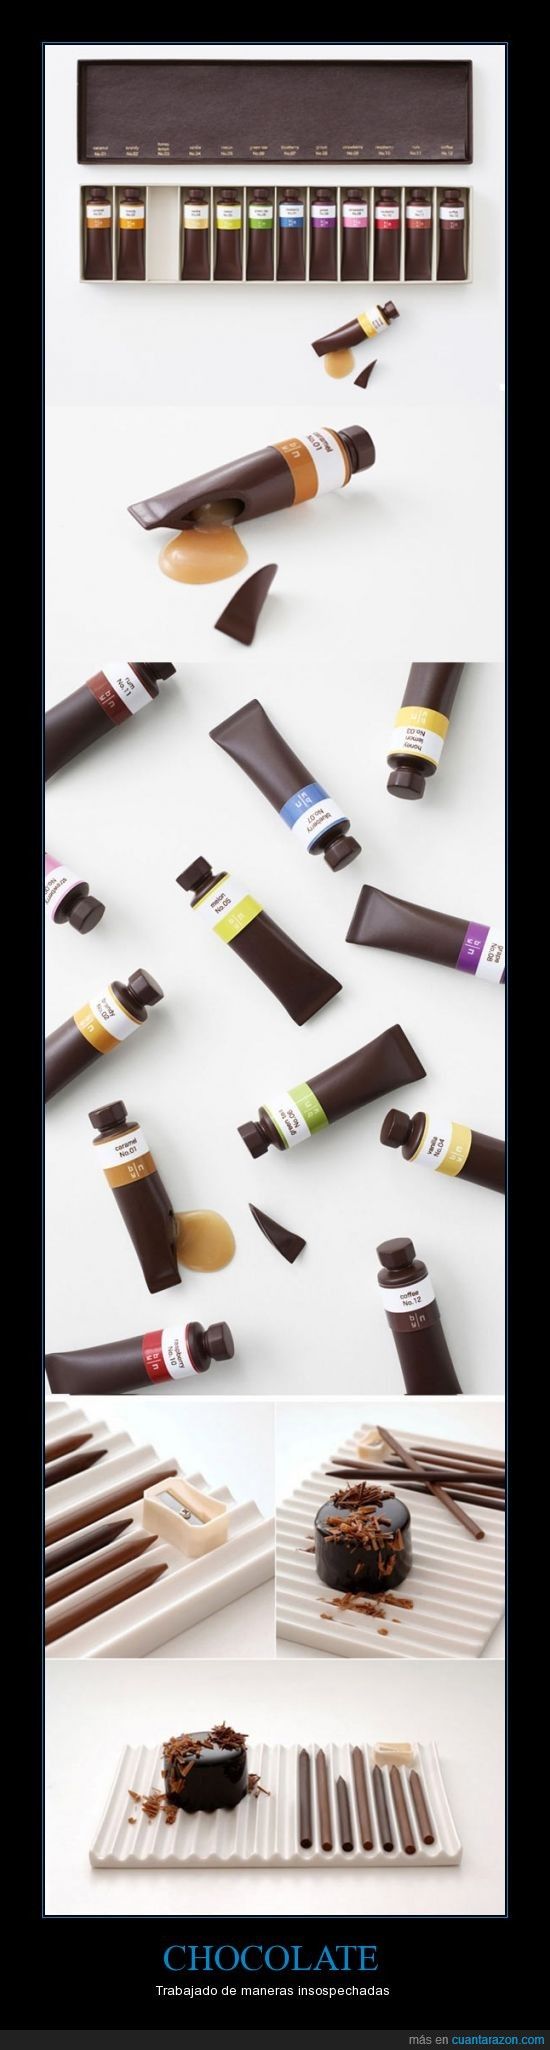 cacao,chocolate,color,innovación,lapices,pintura,punta,repostería